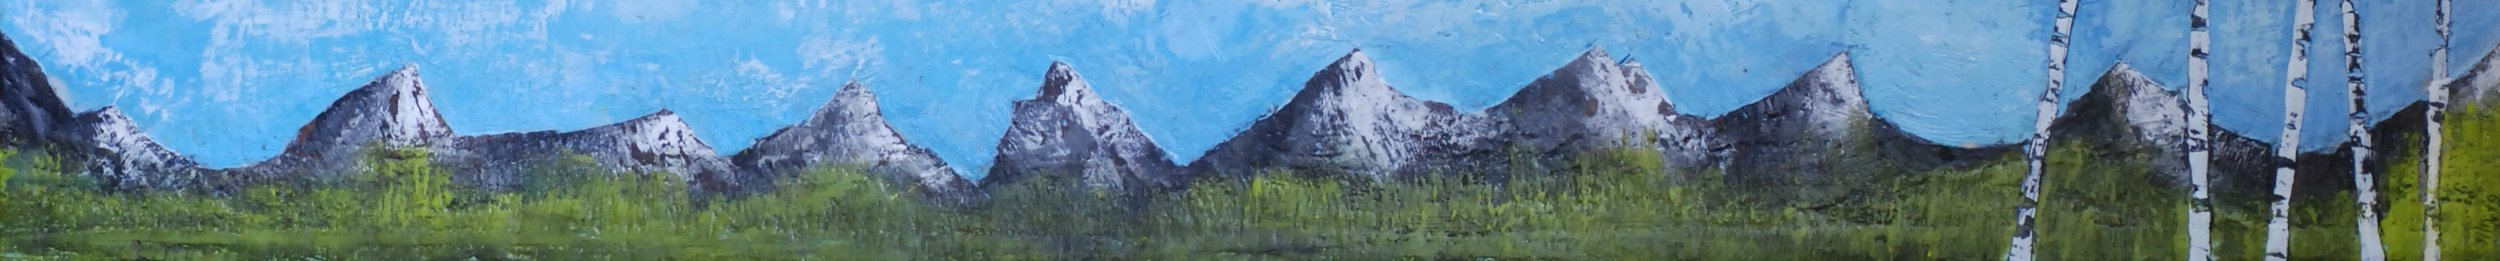 Rythm of the Mountains 48x6